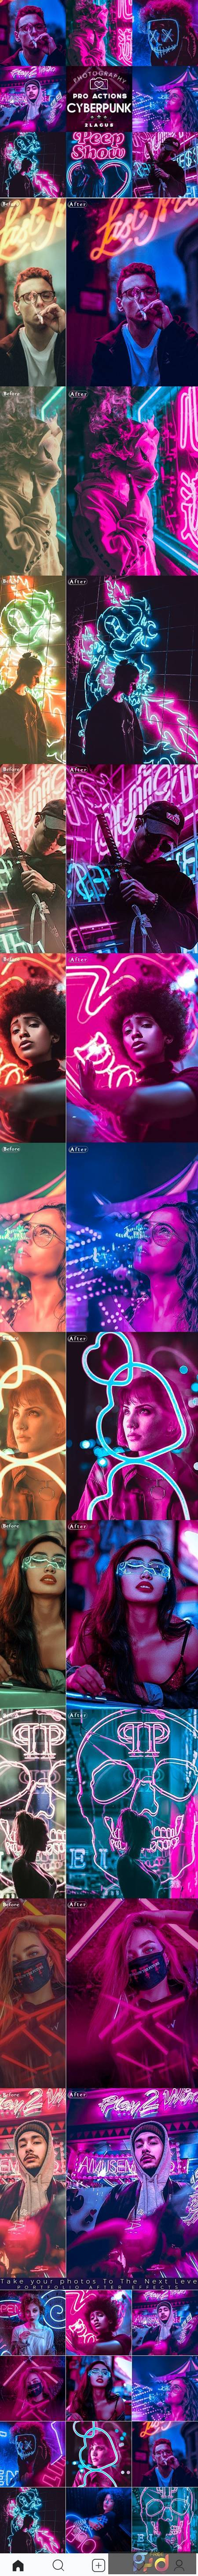 Cyberpunk - Life Styles Photoshop Action 26583405 1